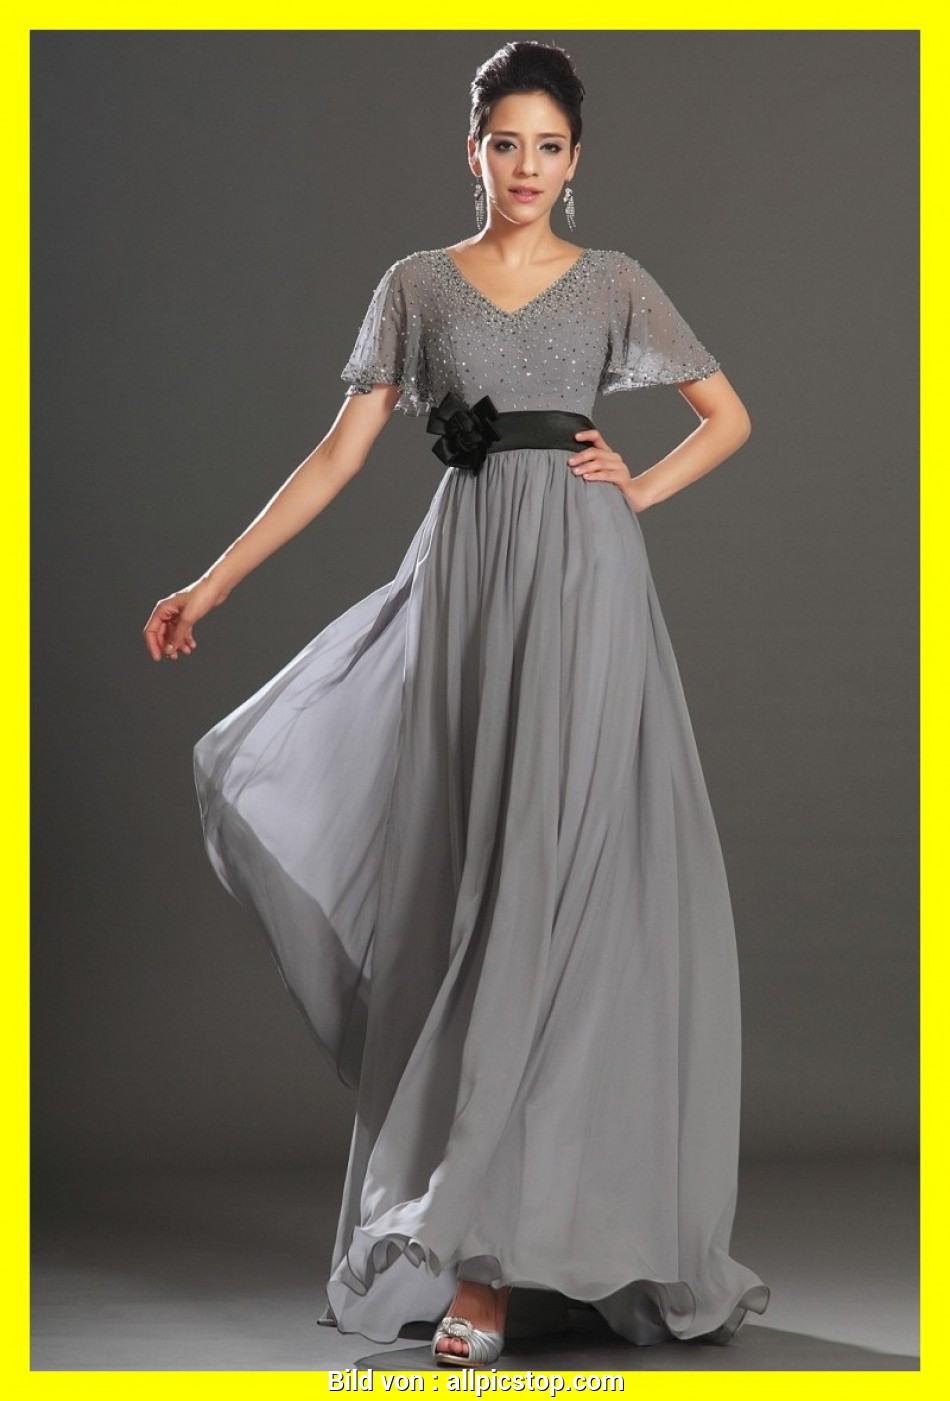 17 Cool Abendkleider Cunda Galerie13 Genial Abendkleider Cunda Stylish